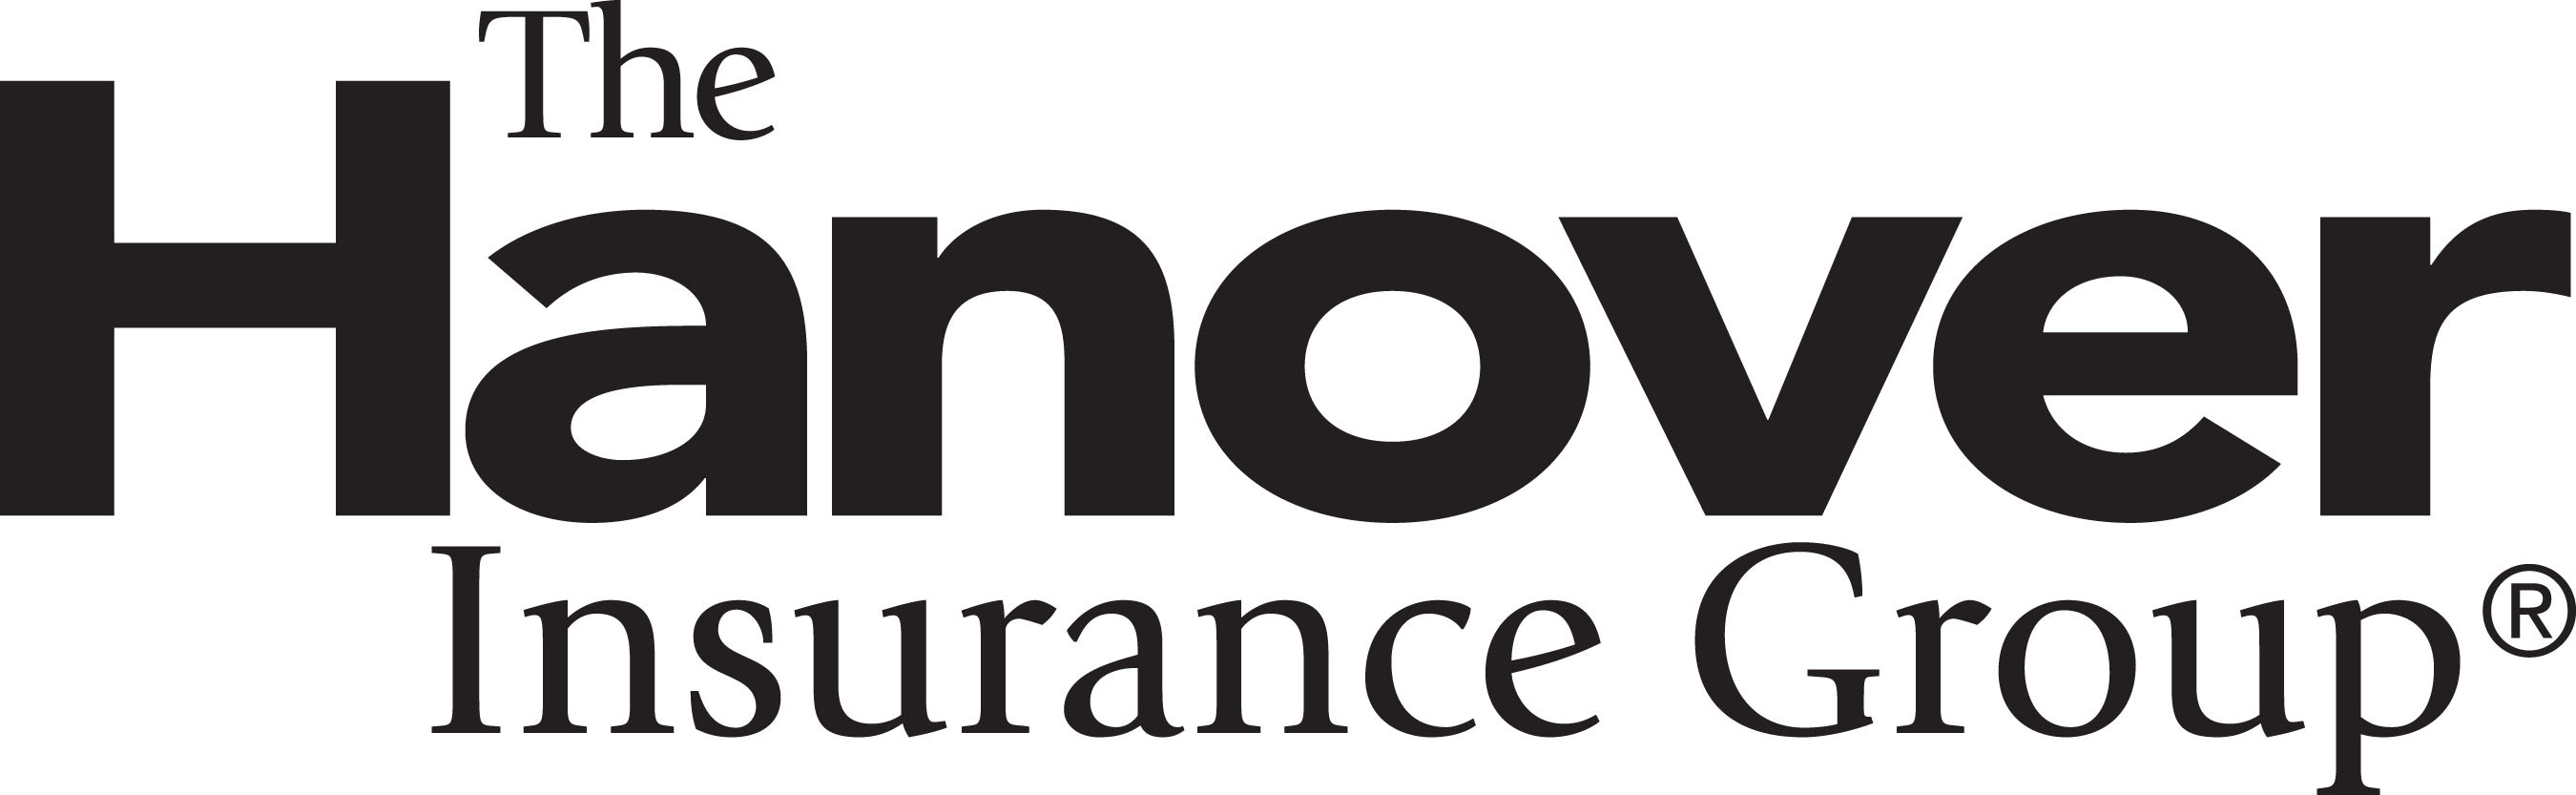 The Hanover Insurance Group, Inc. Logo